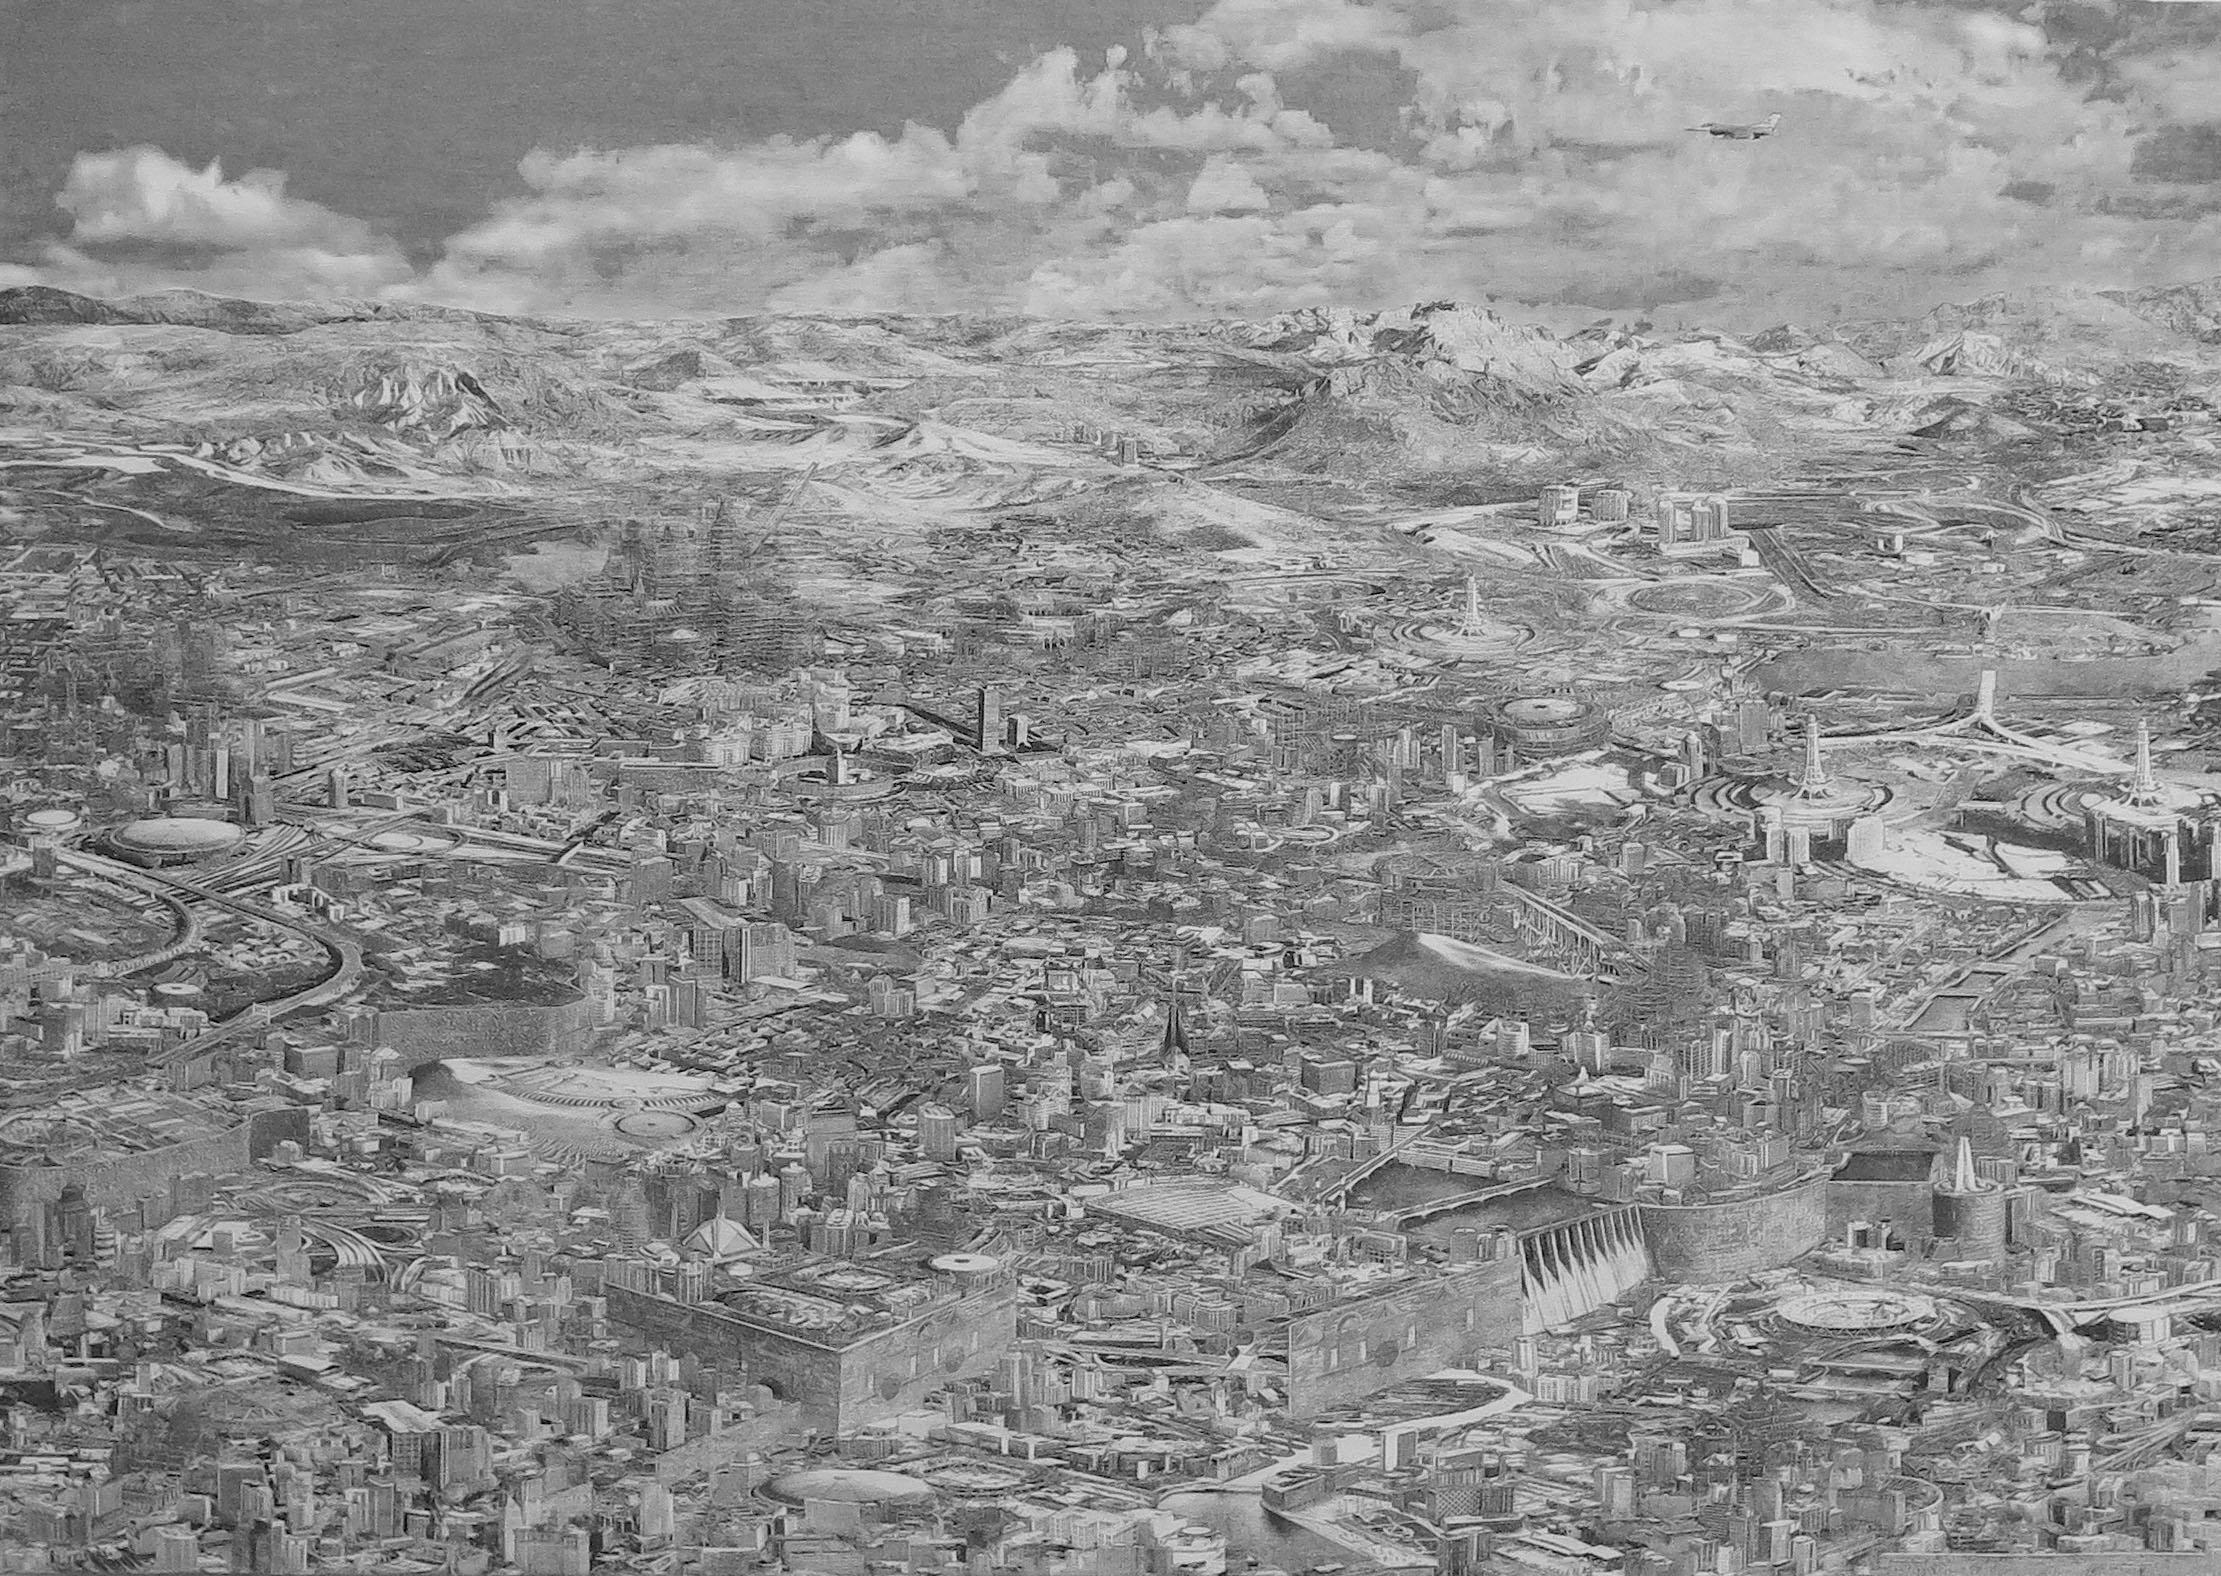 """Minarets,"" 2017, oil on linen, 21 1/2 x 30 1/2 inches"